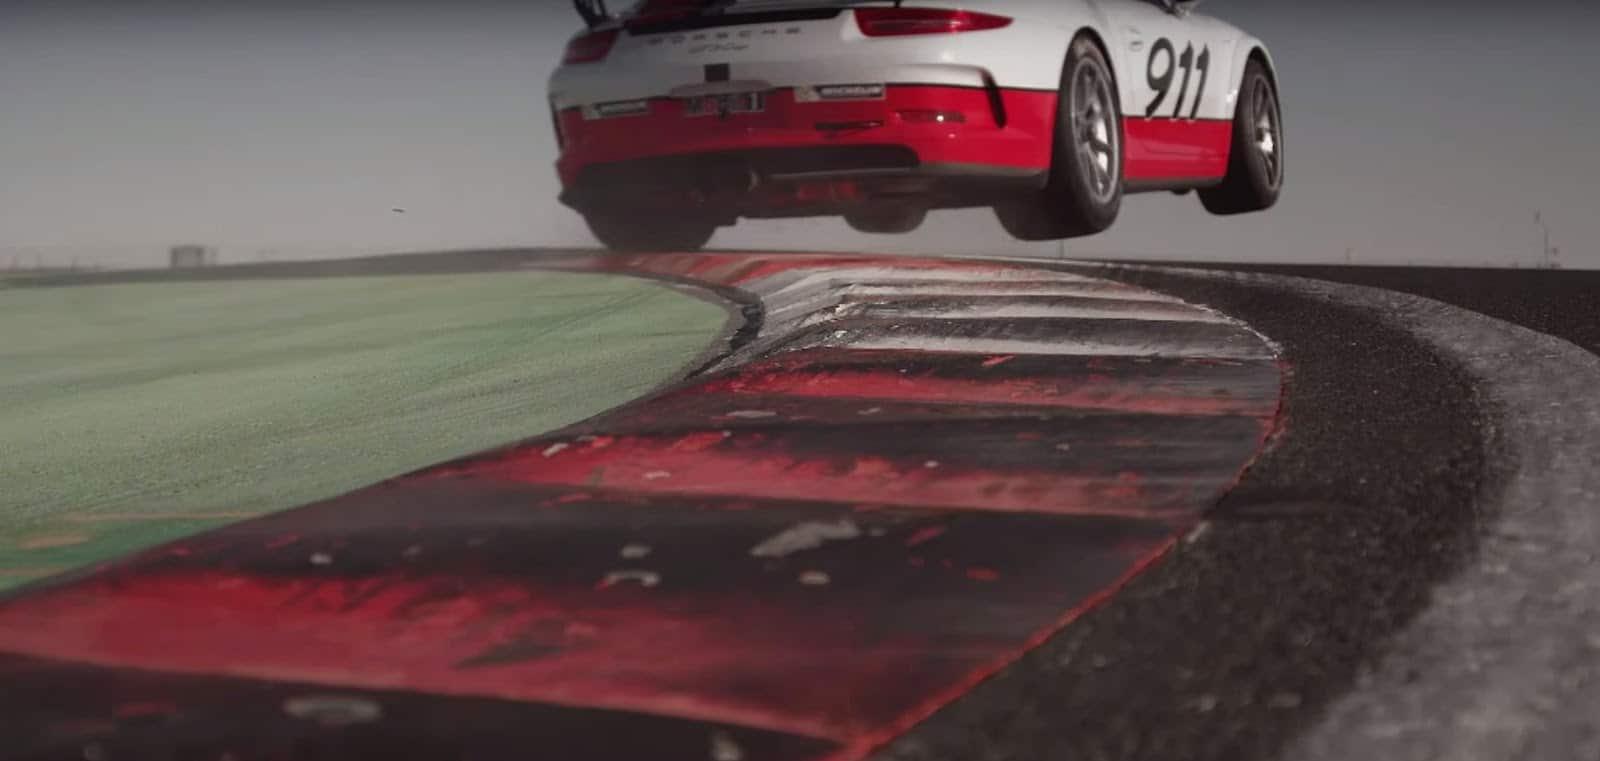 Mark Webber gt3 cup Η Porsche μας αποδεικνύει ότι ούτε οι οδηγοί αγώνων μπορούν να οδηγούν και να στέλνουν μηνύματα Mark Webber, Porsche, Porsche 911 GT3, Porsche 911 GT3 Cup, videos